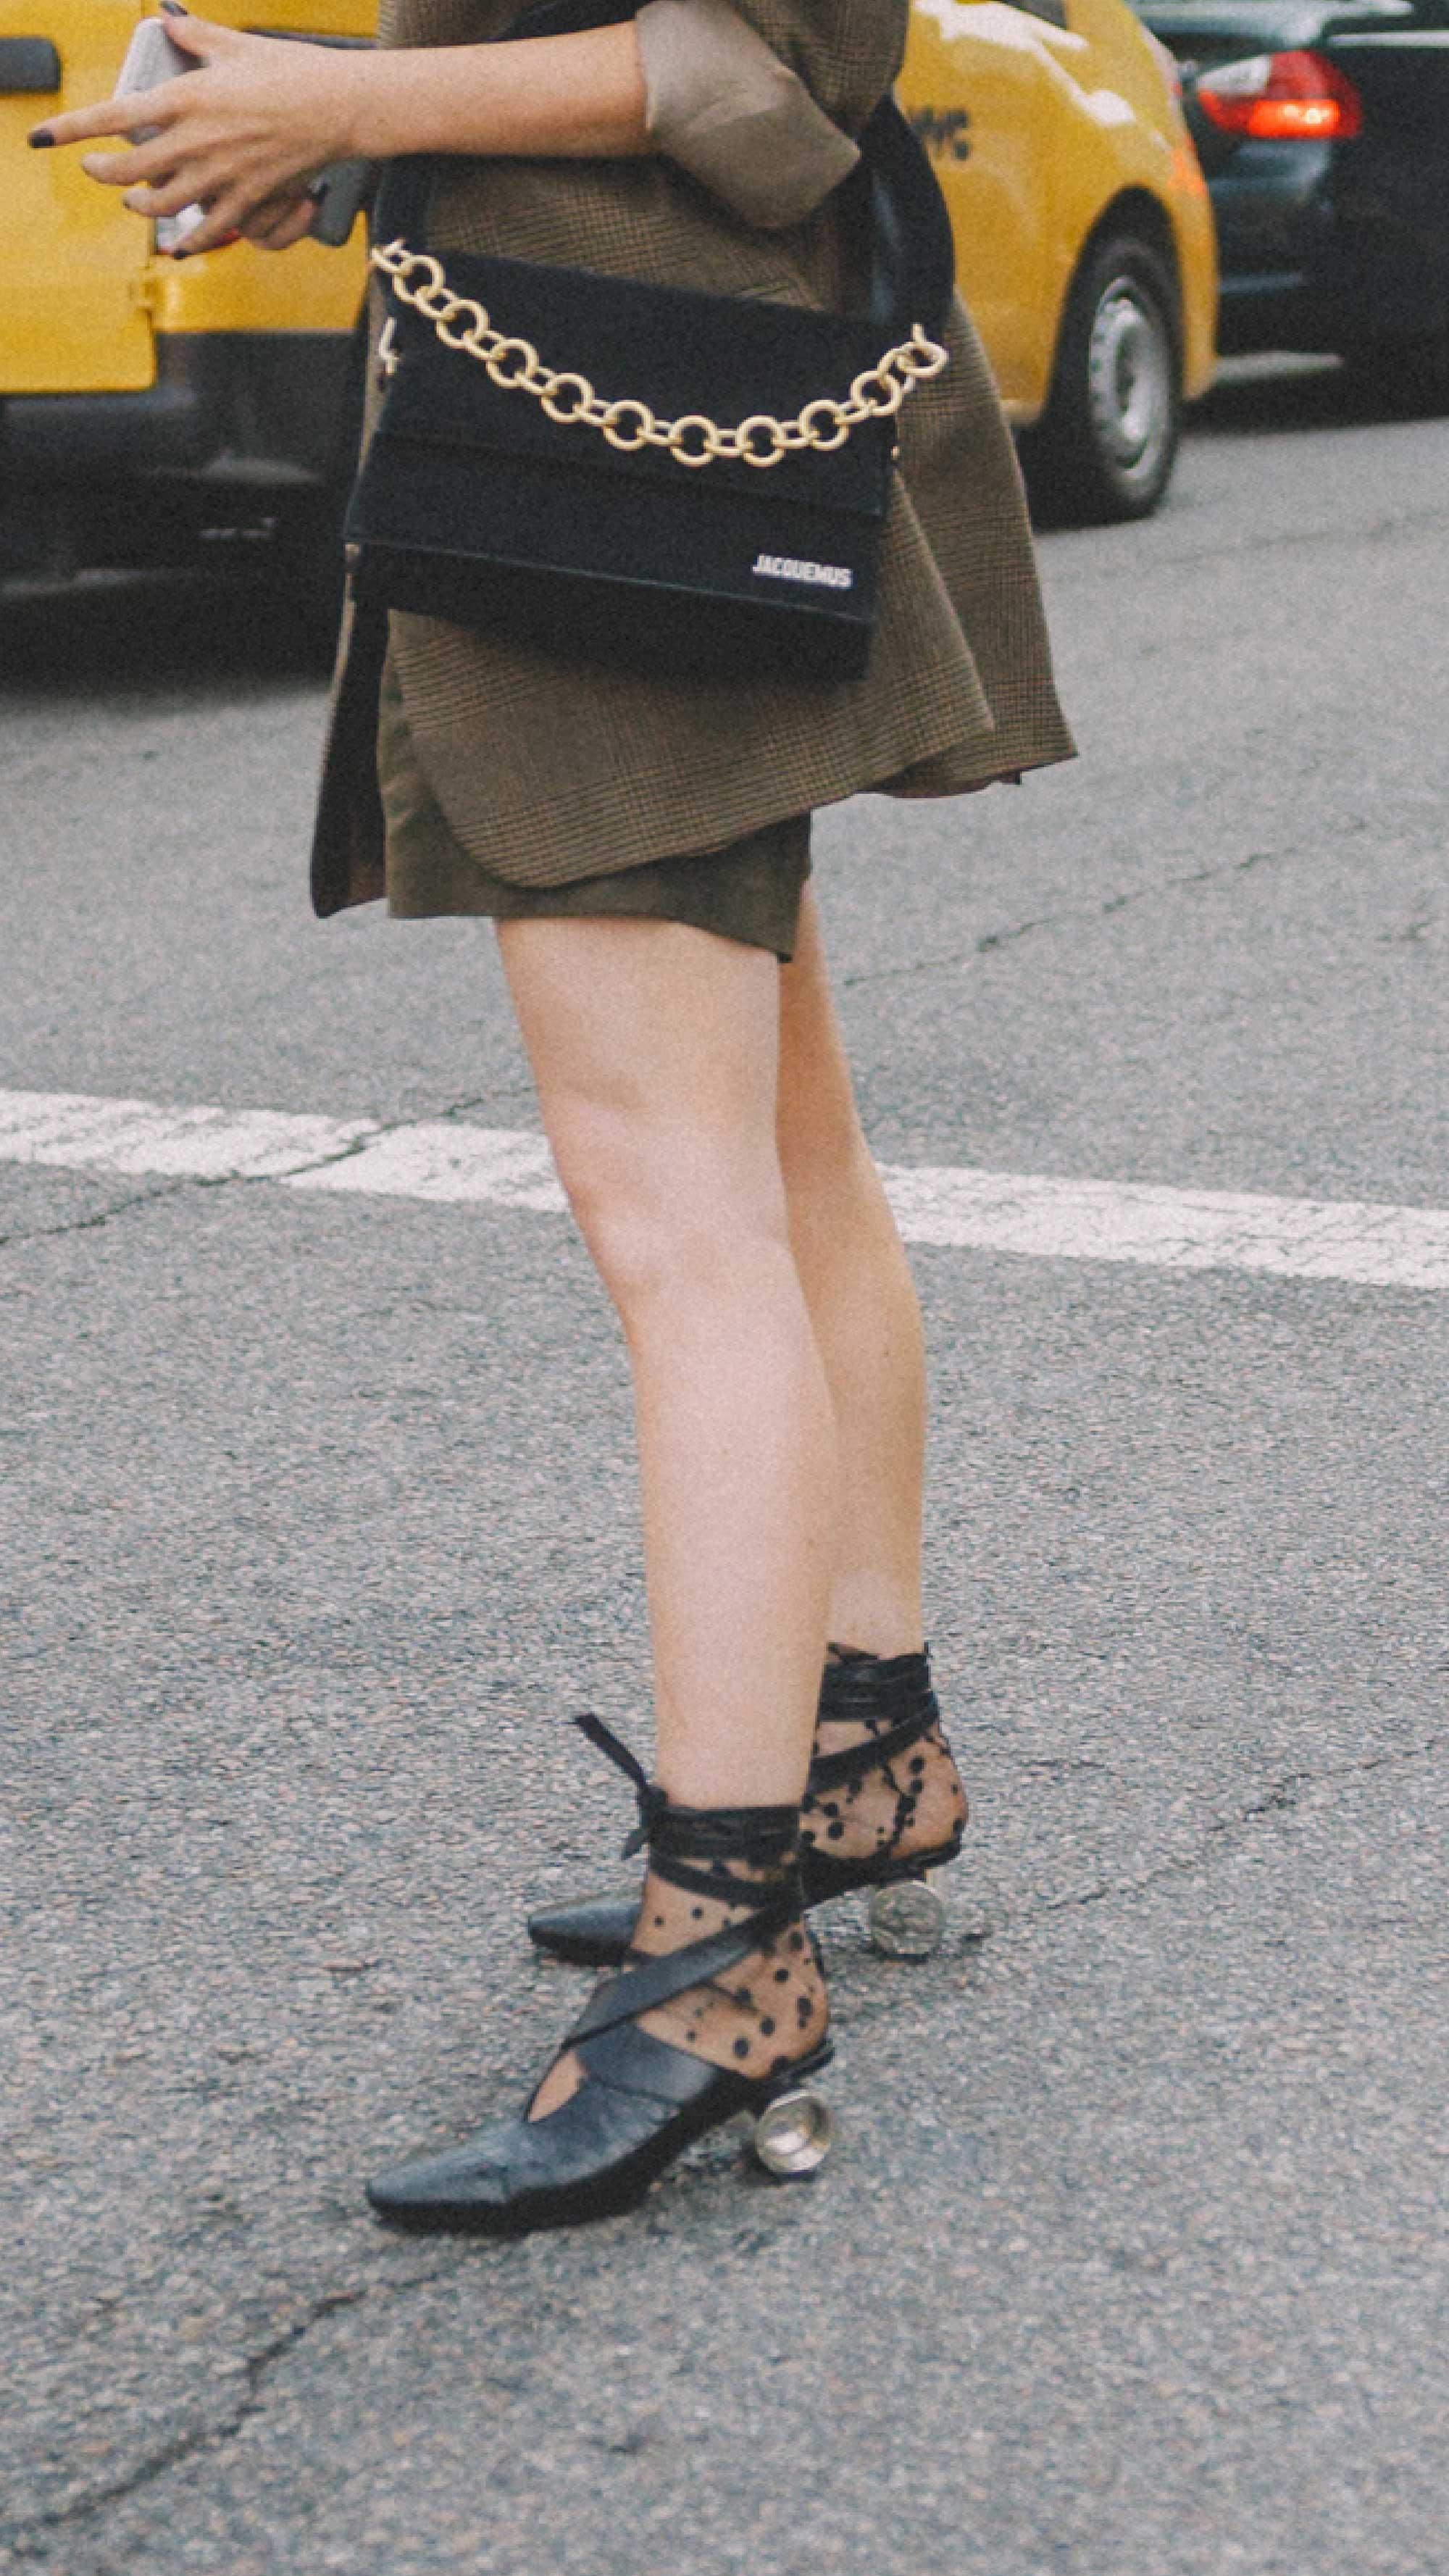 New-York-Fashion-Week-NYFW-SS18-street-style-day-one3.jpg